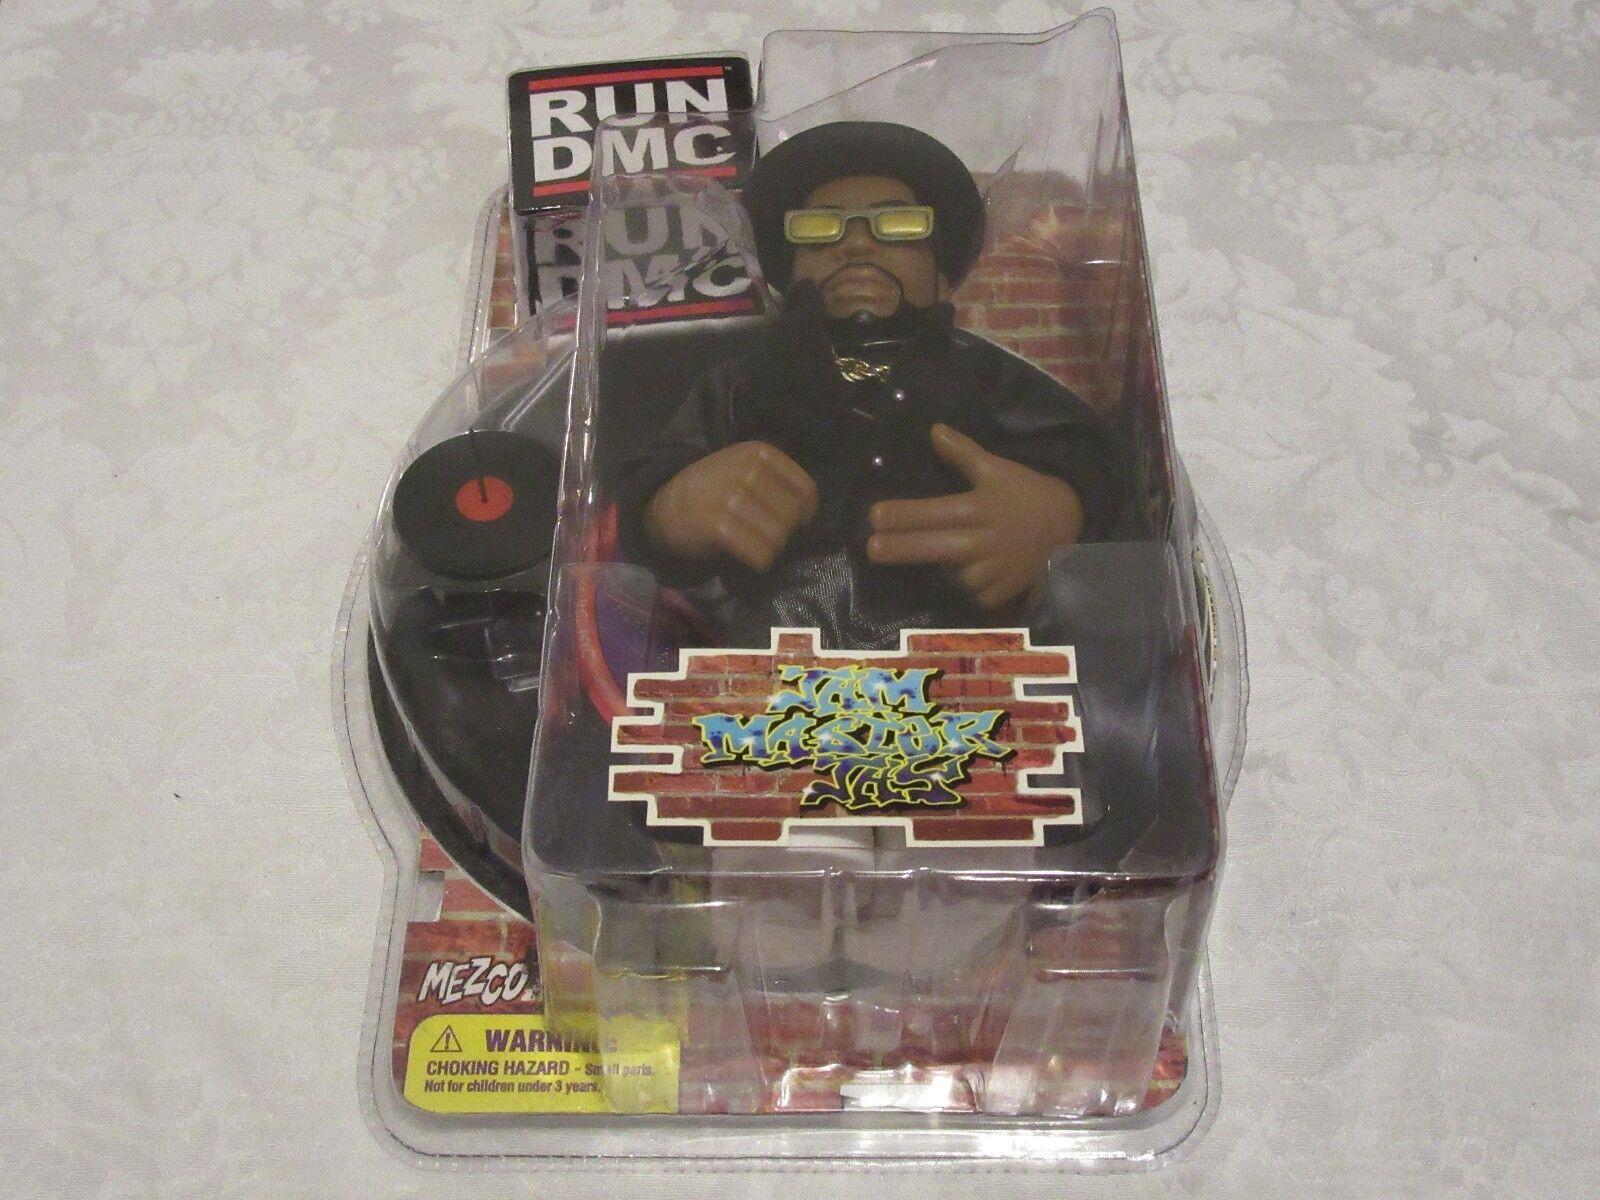 Mezco 2002 Run DMC Jam Master Jay Action Figure A